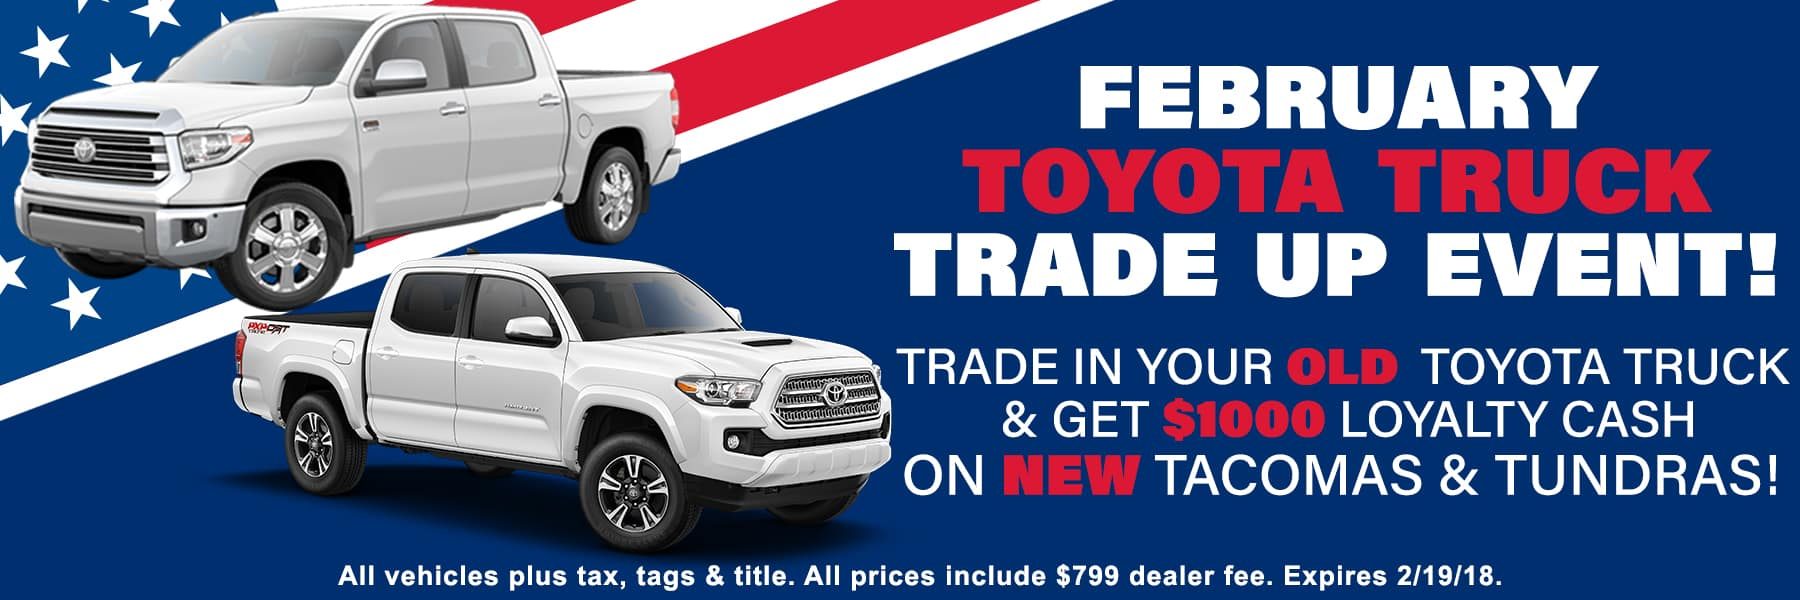 Feb Truck Trade